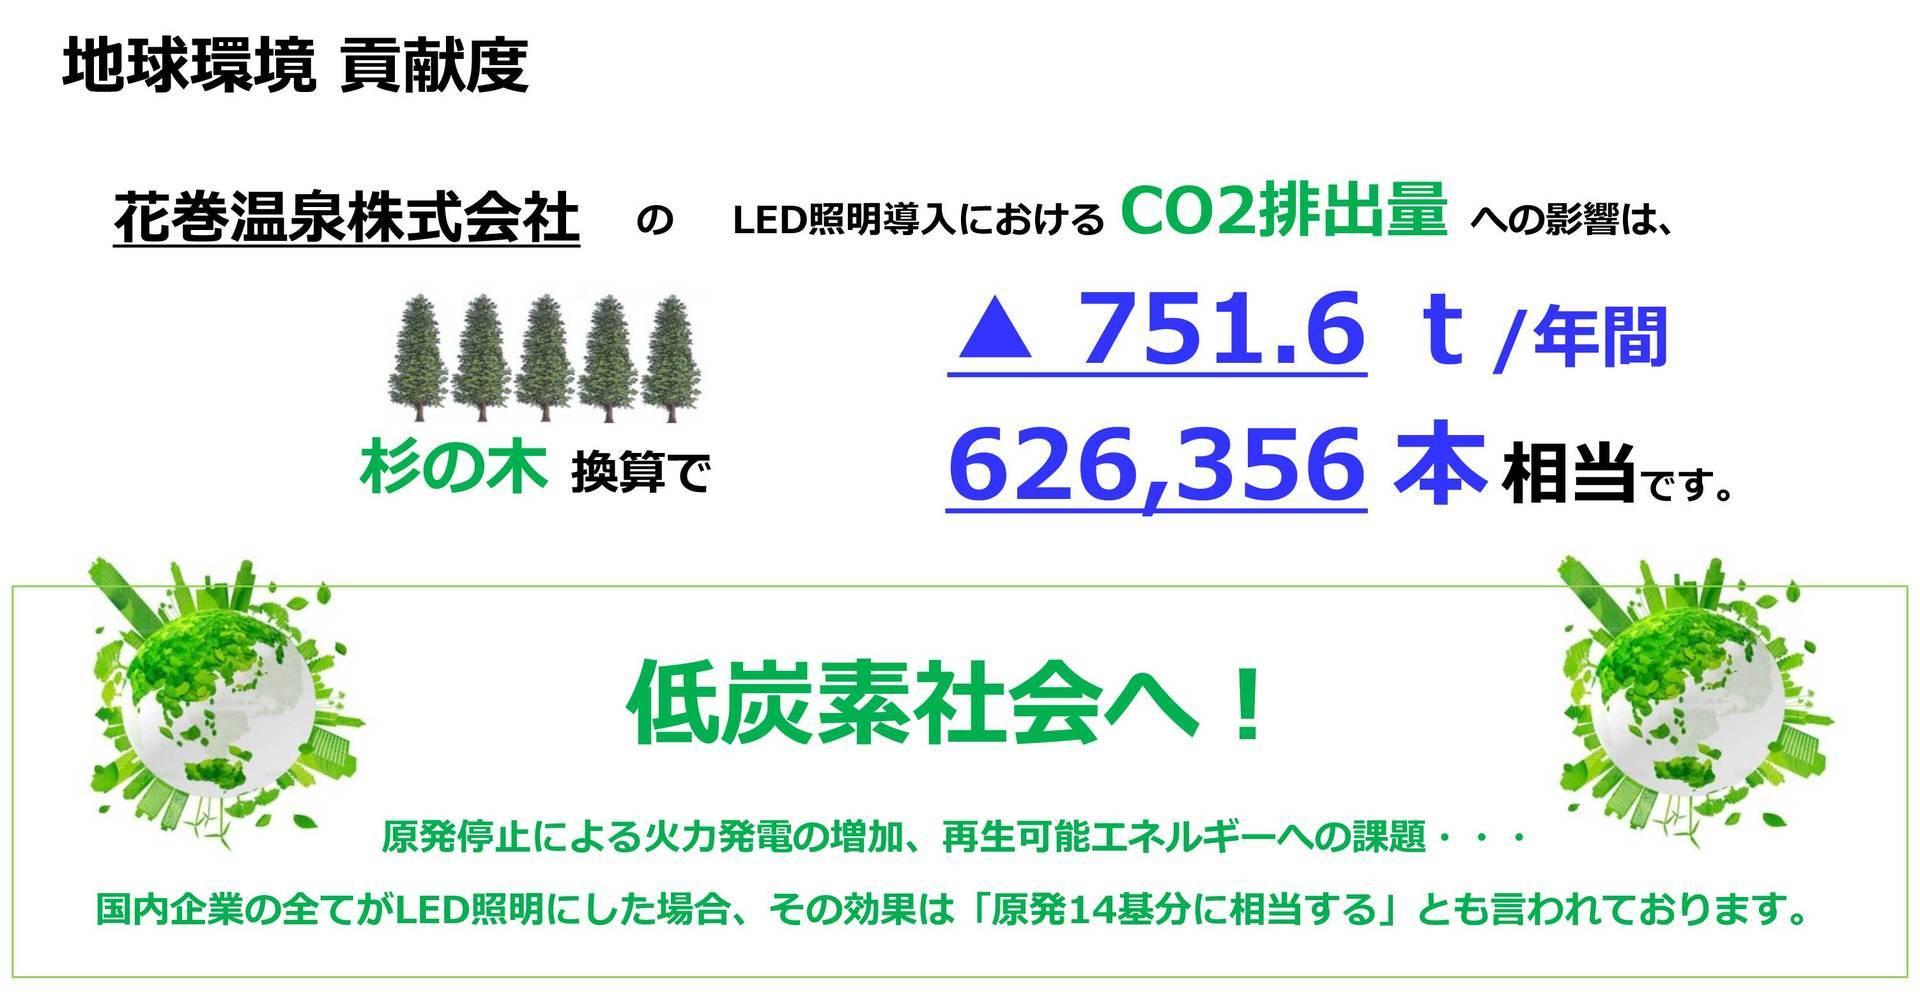 2018_CO2削減_花巻温泉株式会社.jpg